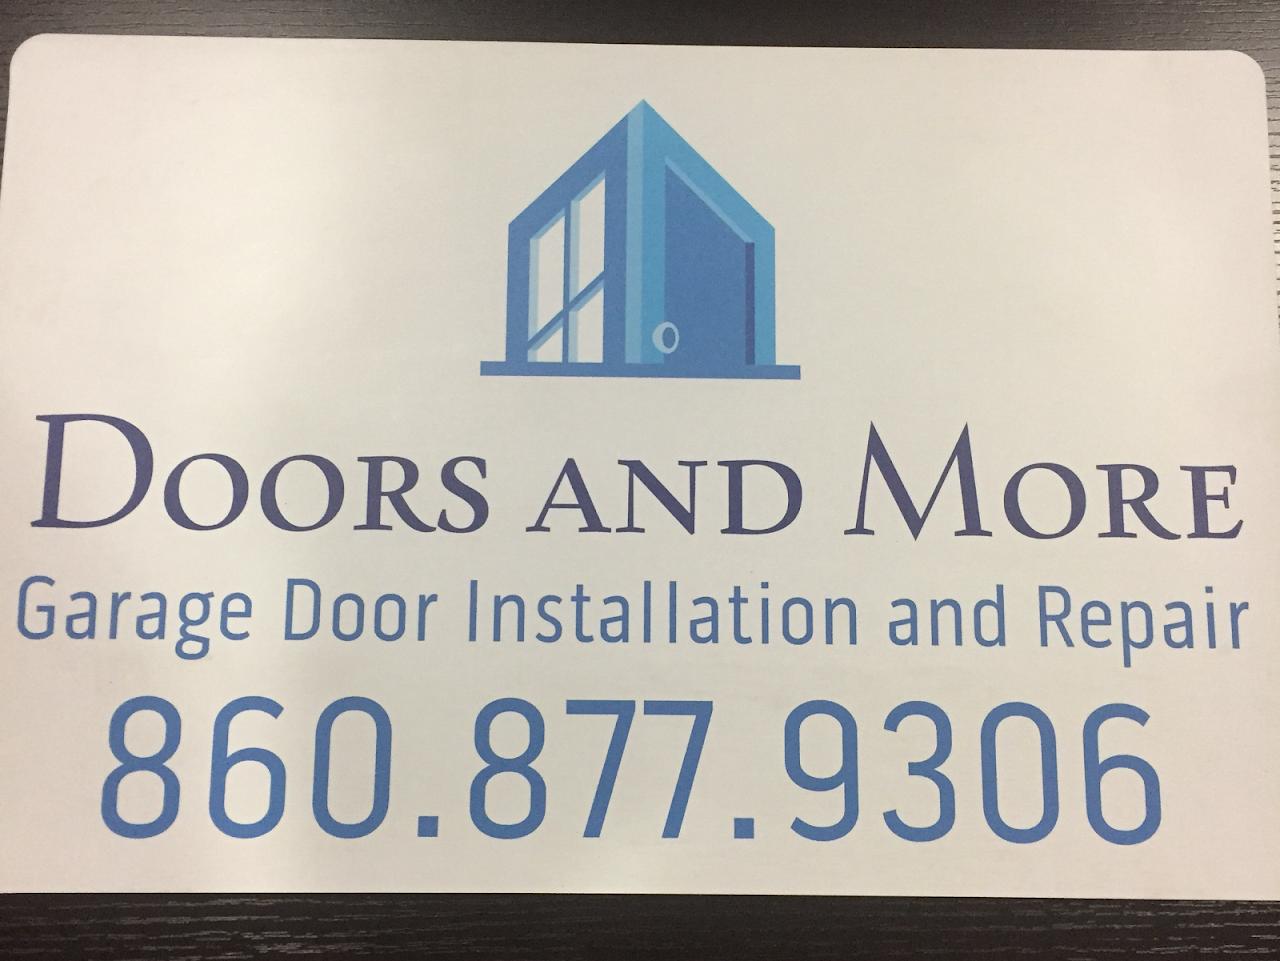 picture doors solutions ideas size discount coupongarage garage of door springsgarage electric nation full extraordinary